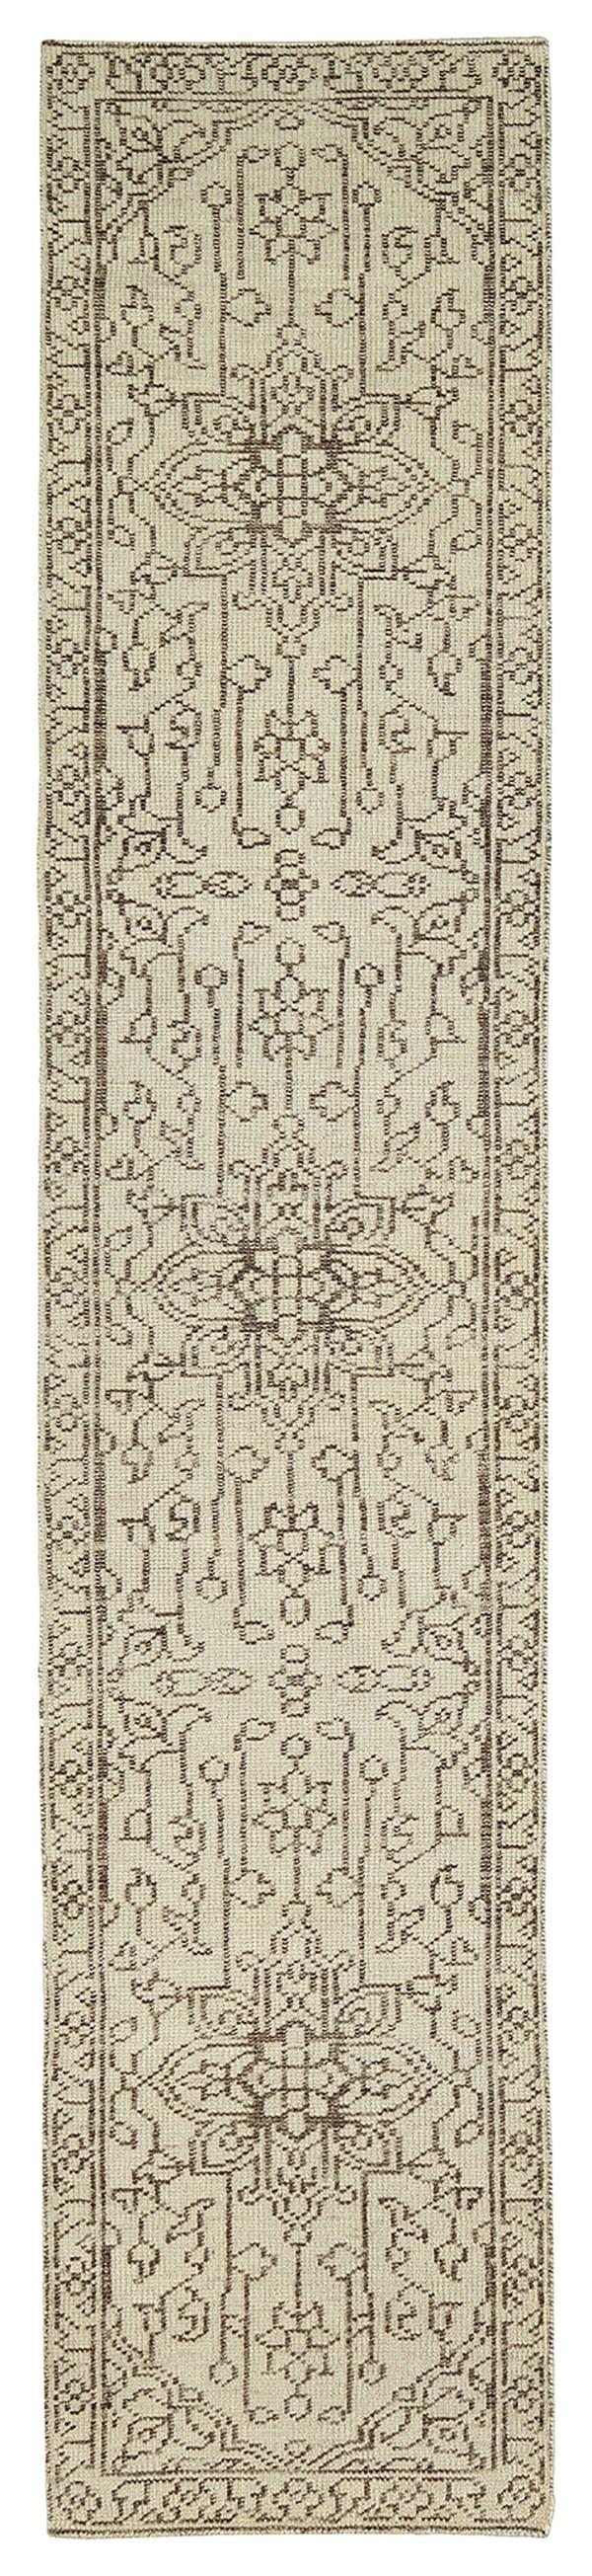 Beige (03) Traditional / Oriental Area Rug